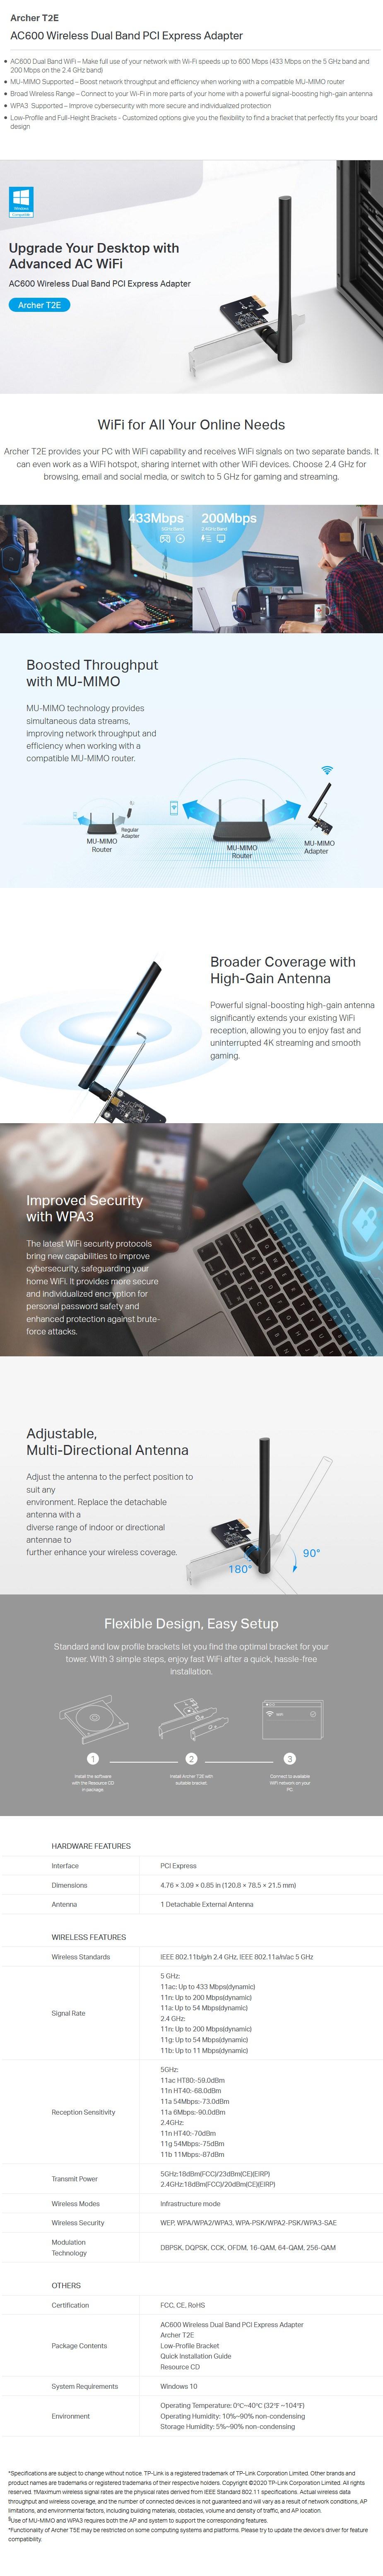 tplink-archer-t2e-ac600-dual-band-pci-express-wireless-adapter-ac42211-2.jpg